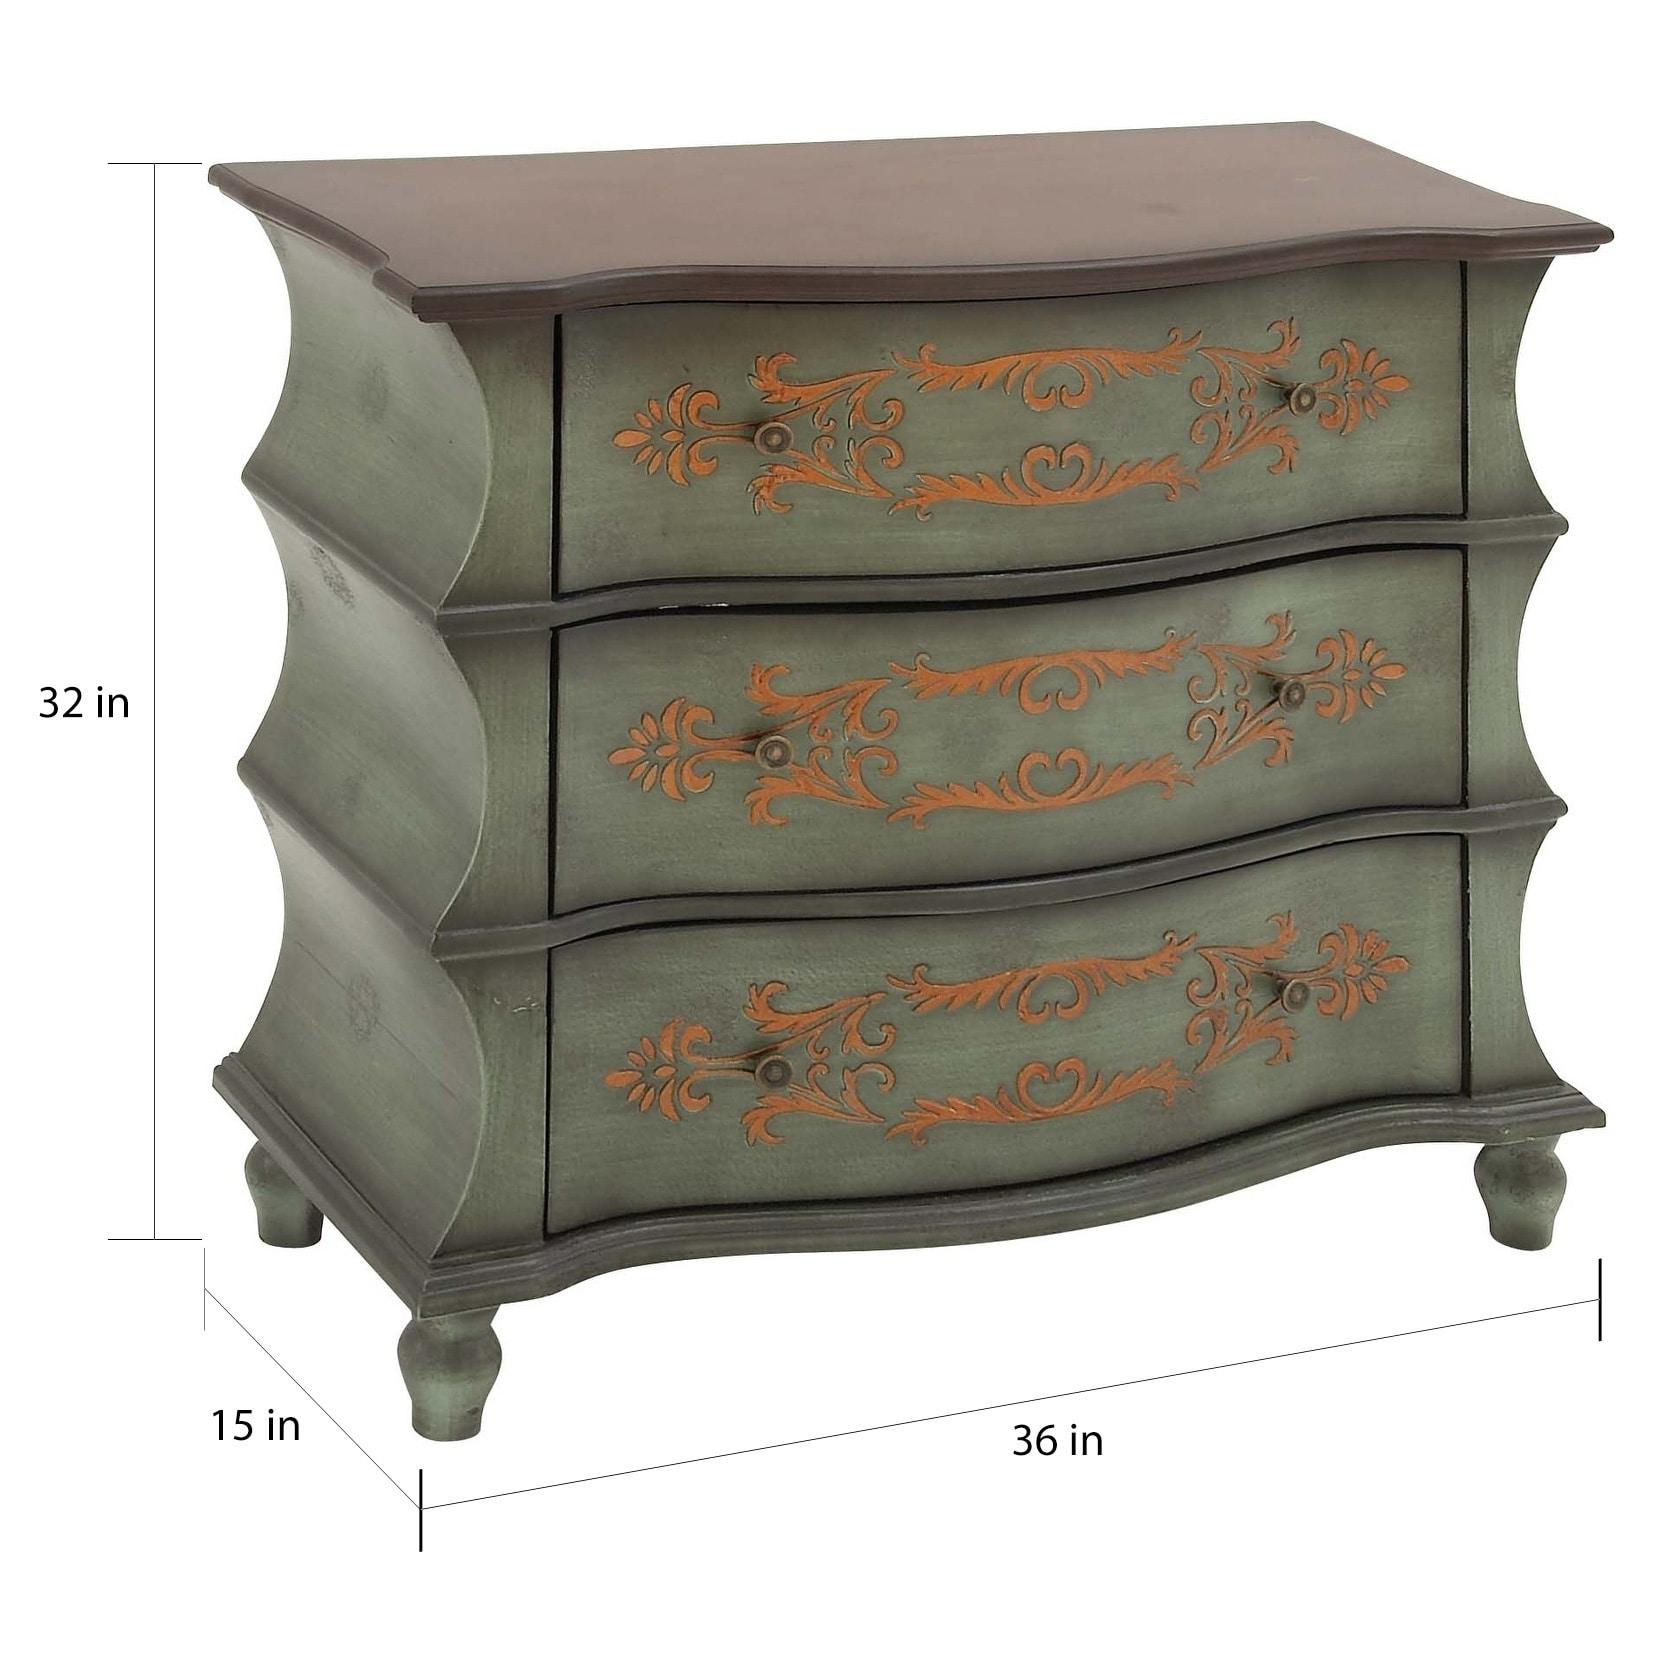 Pleasing Traditional 32 X 36 Inch Distressed Green Wooden Dresser By Studio 350 Interior Design Ideas Philsoteloinfo